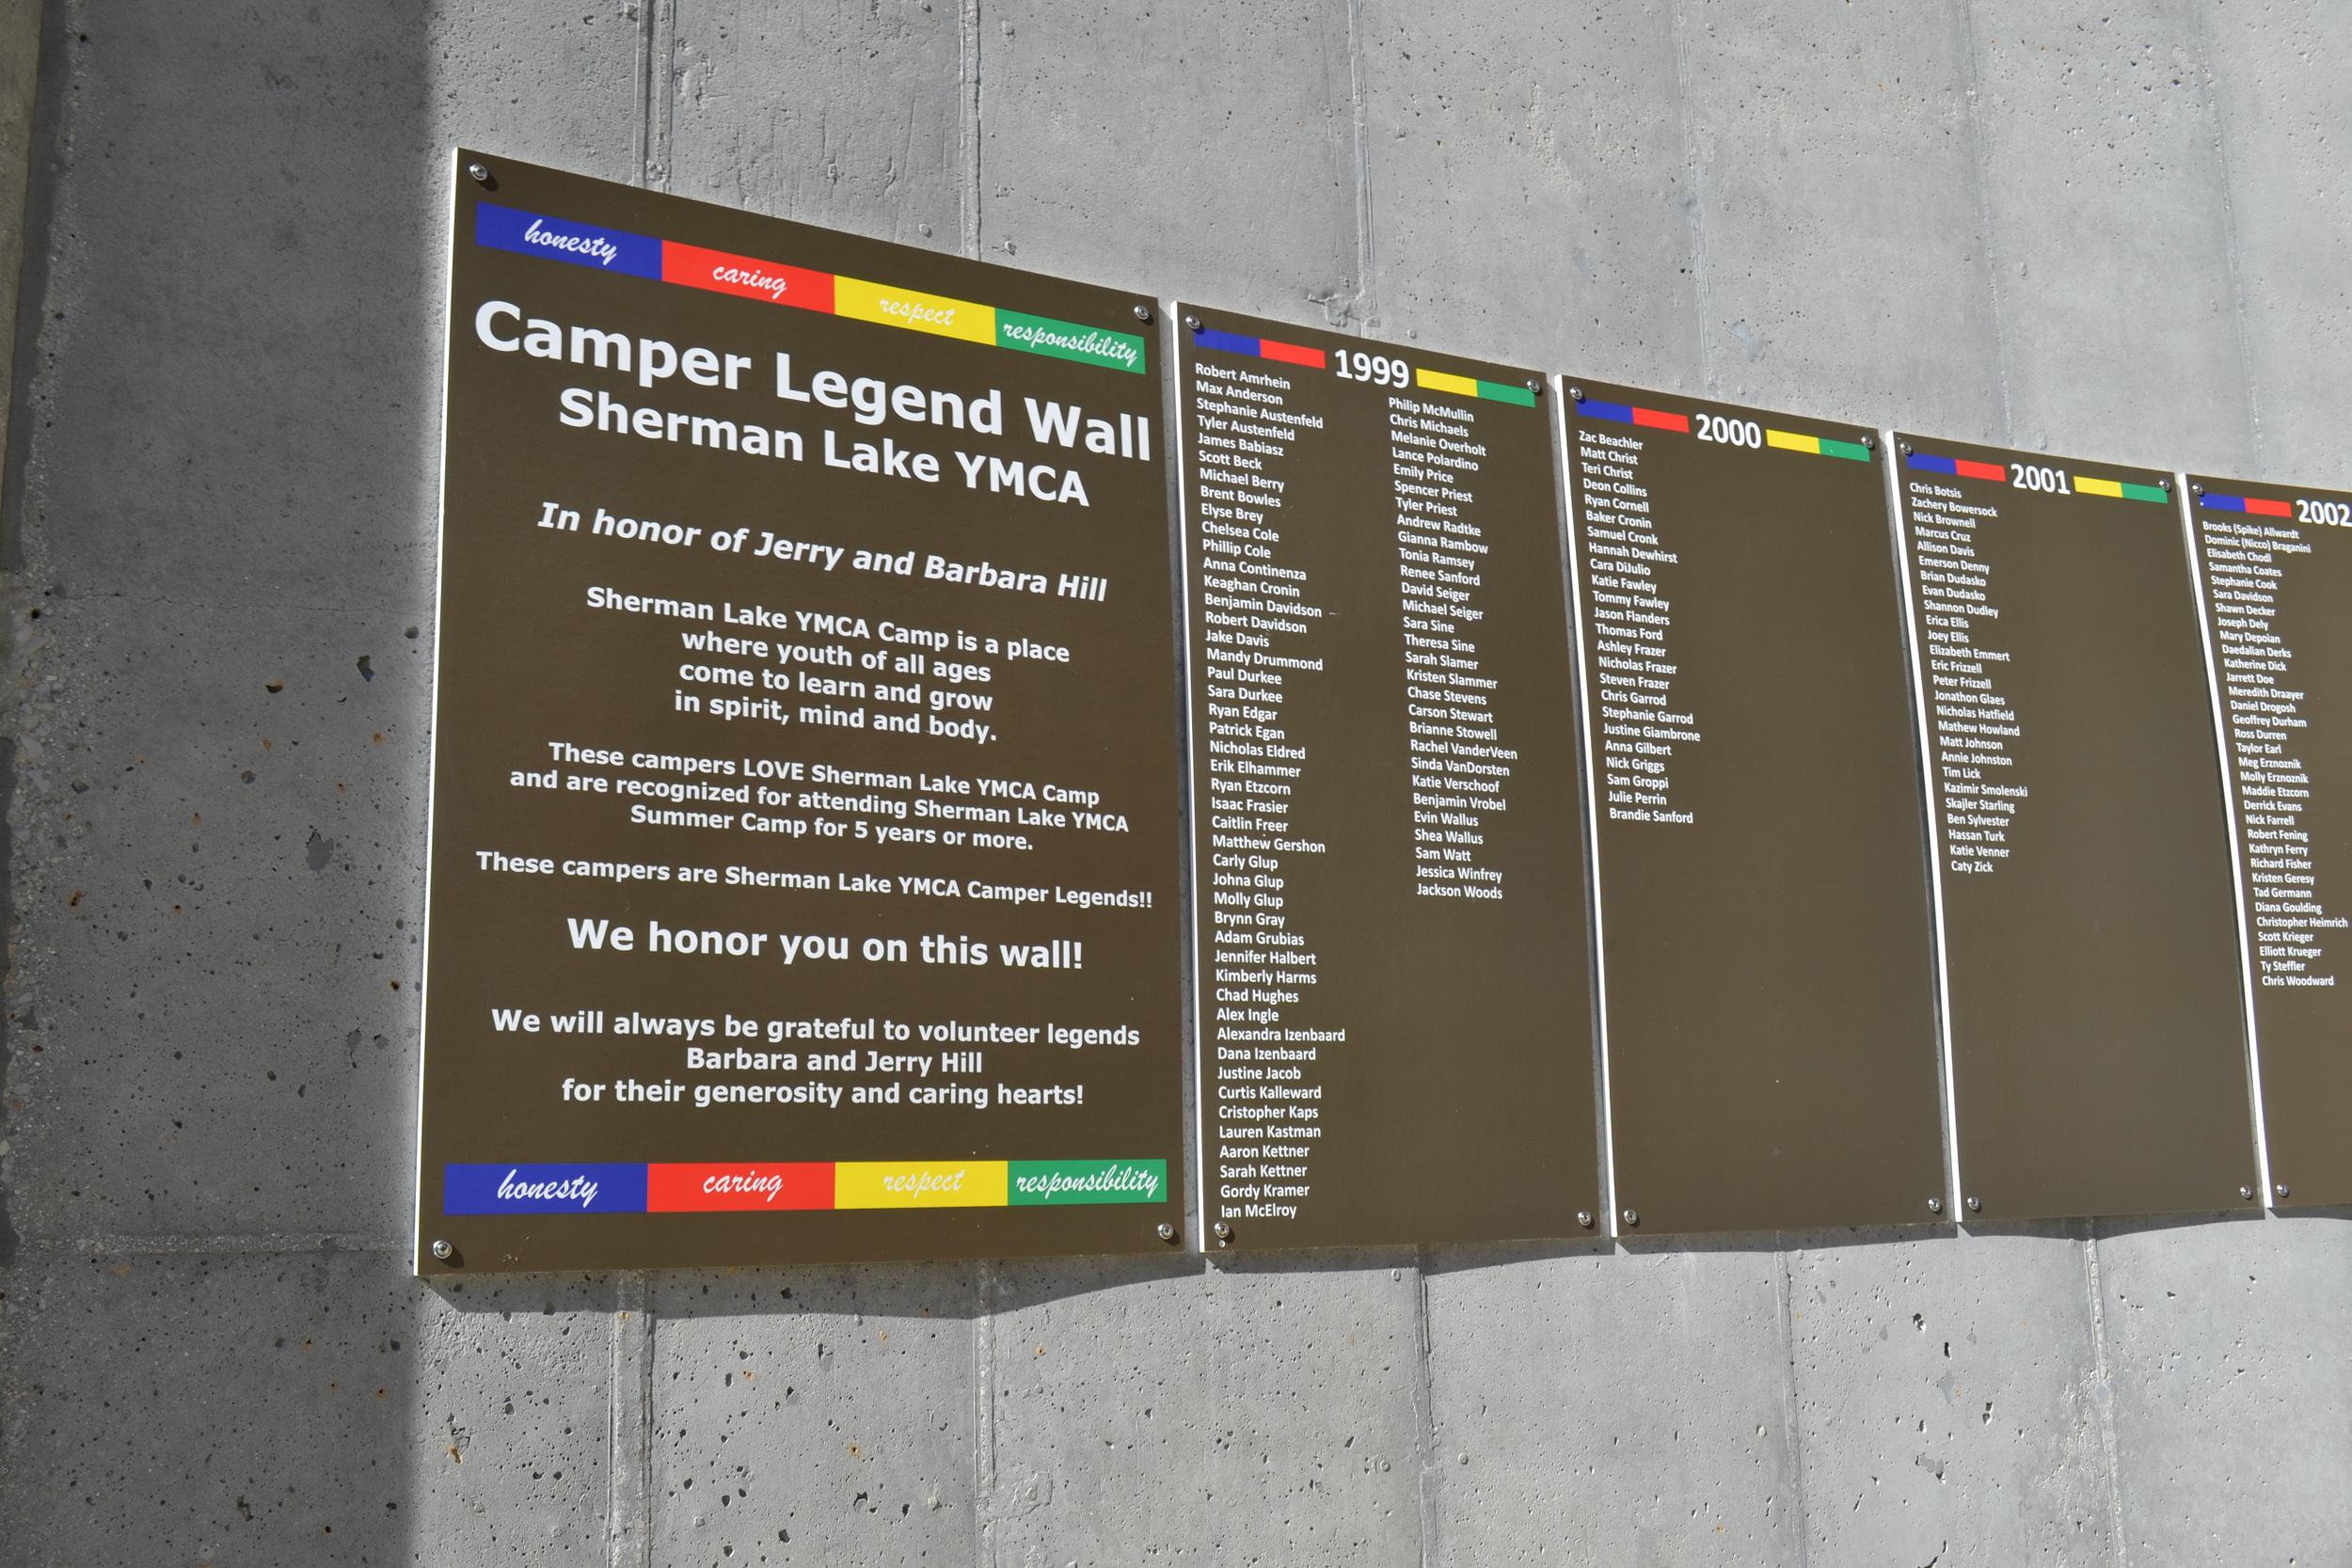 Camper Legend Wall Sherman Lake